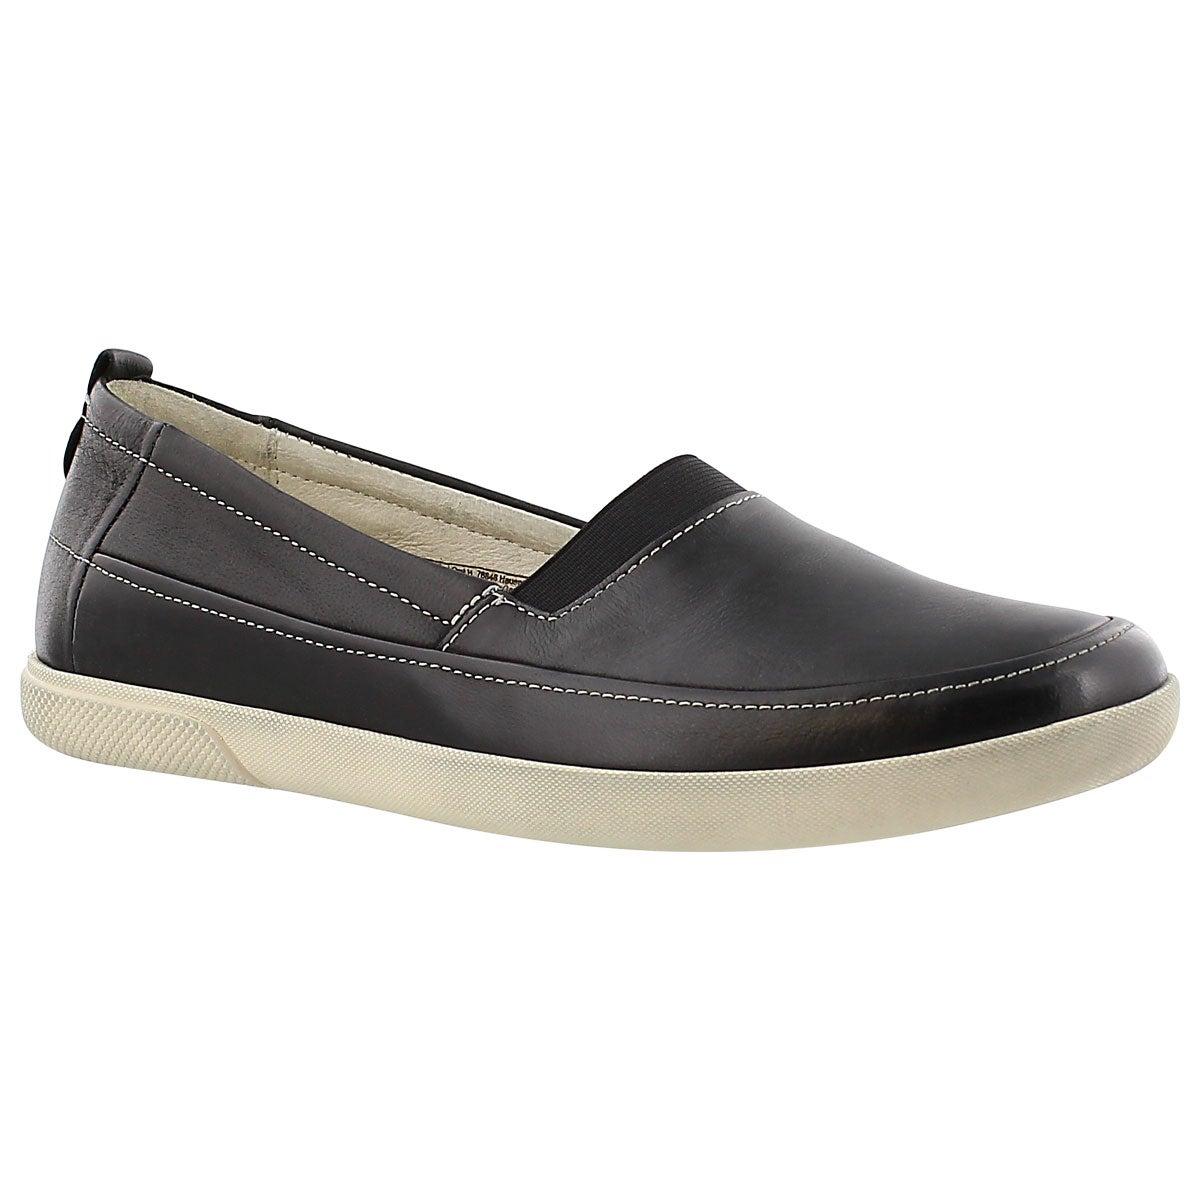 Lds Ciara 11 black slip on casual shoe